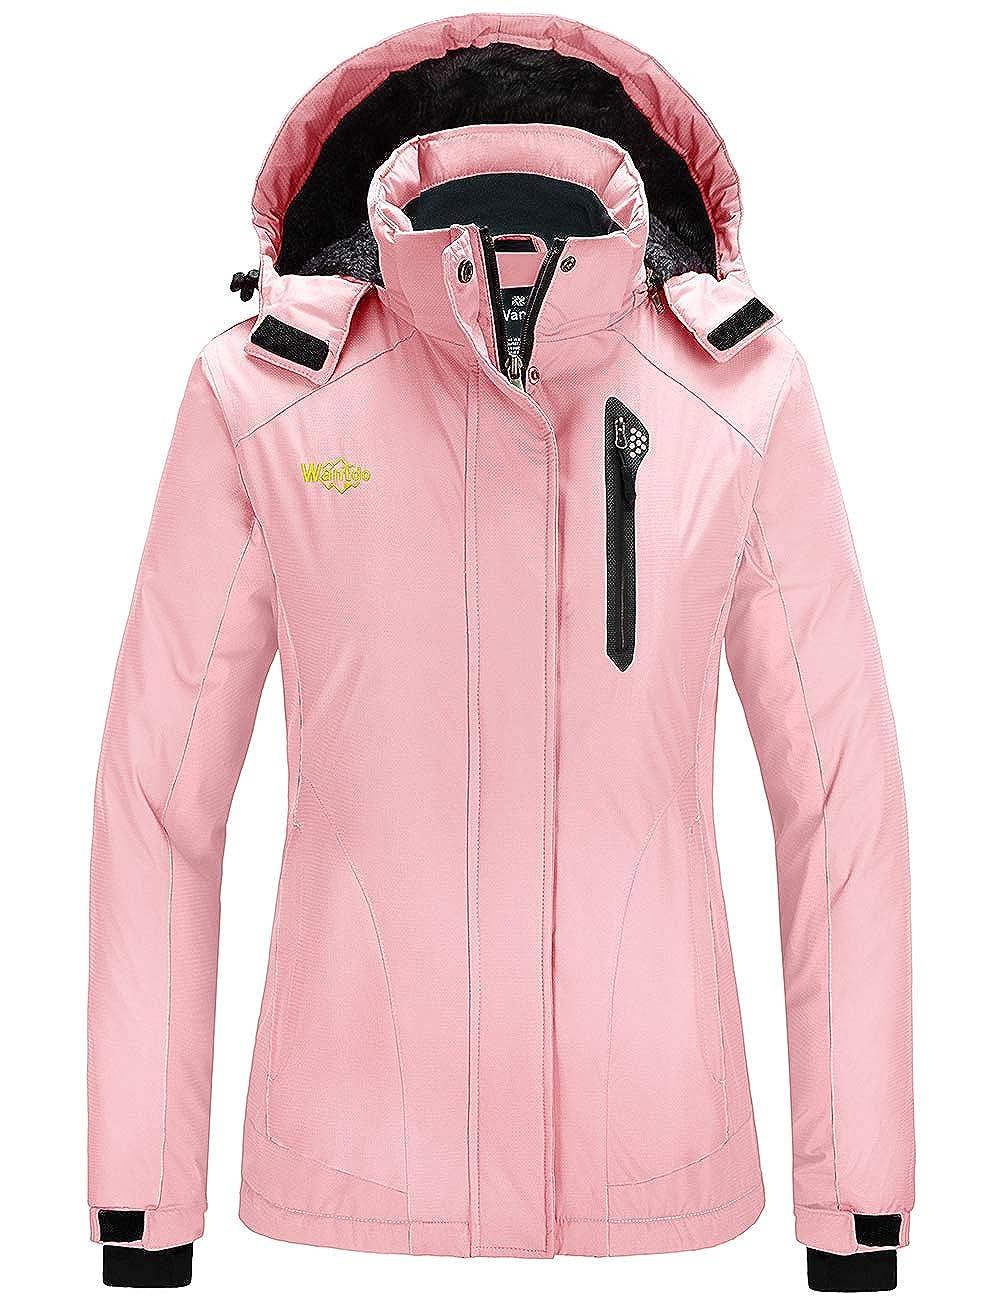 Wantdo Womens Waterproof Ski Jacket Mountain Snow Coats Hooded Windproof Parka